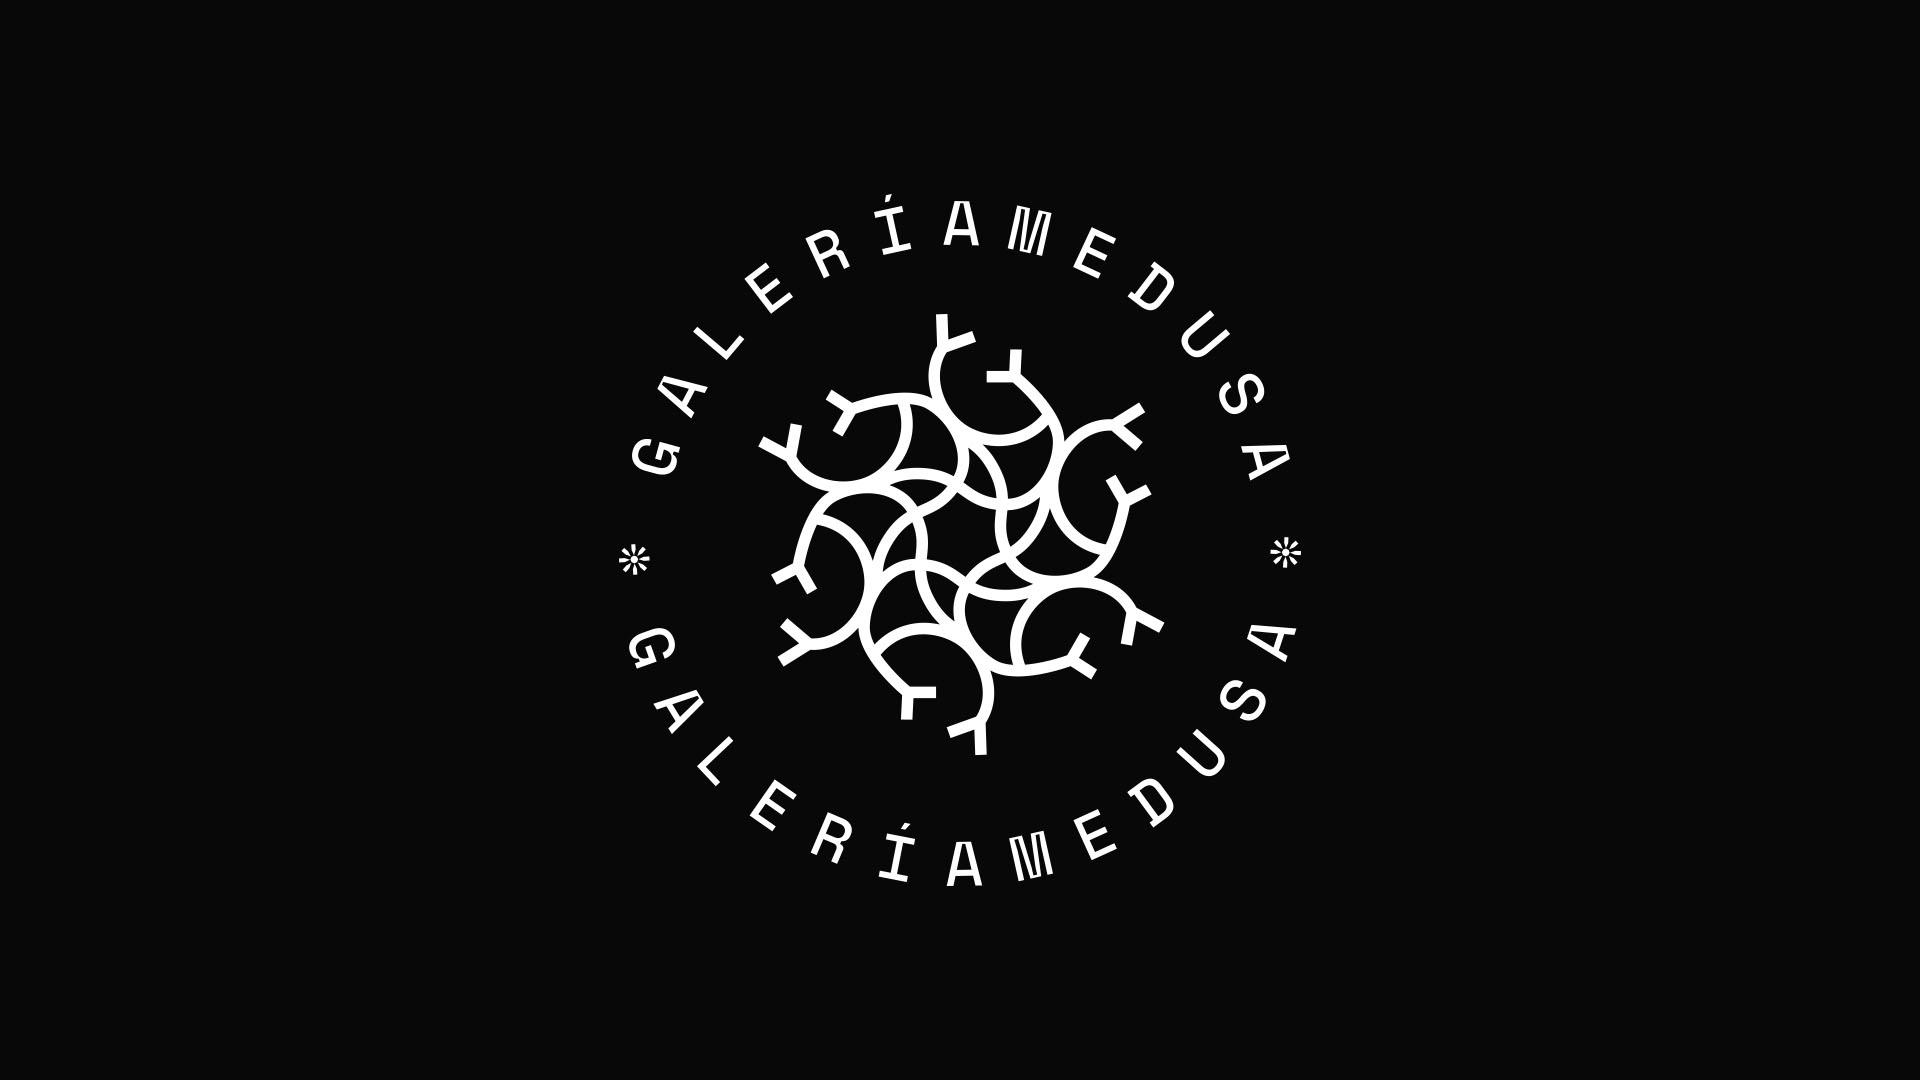 Diseño de logo minimal moderno